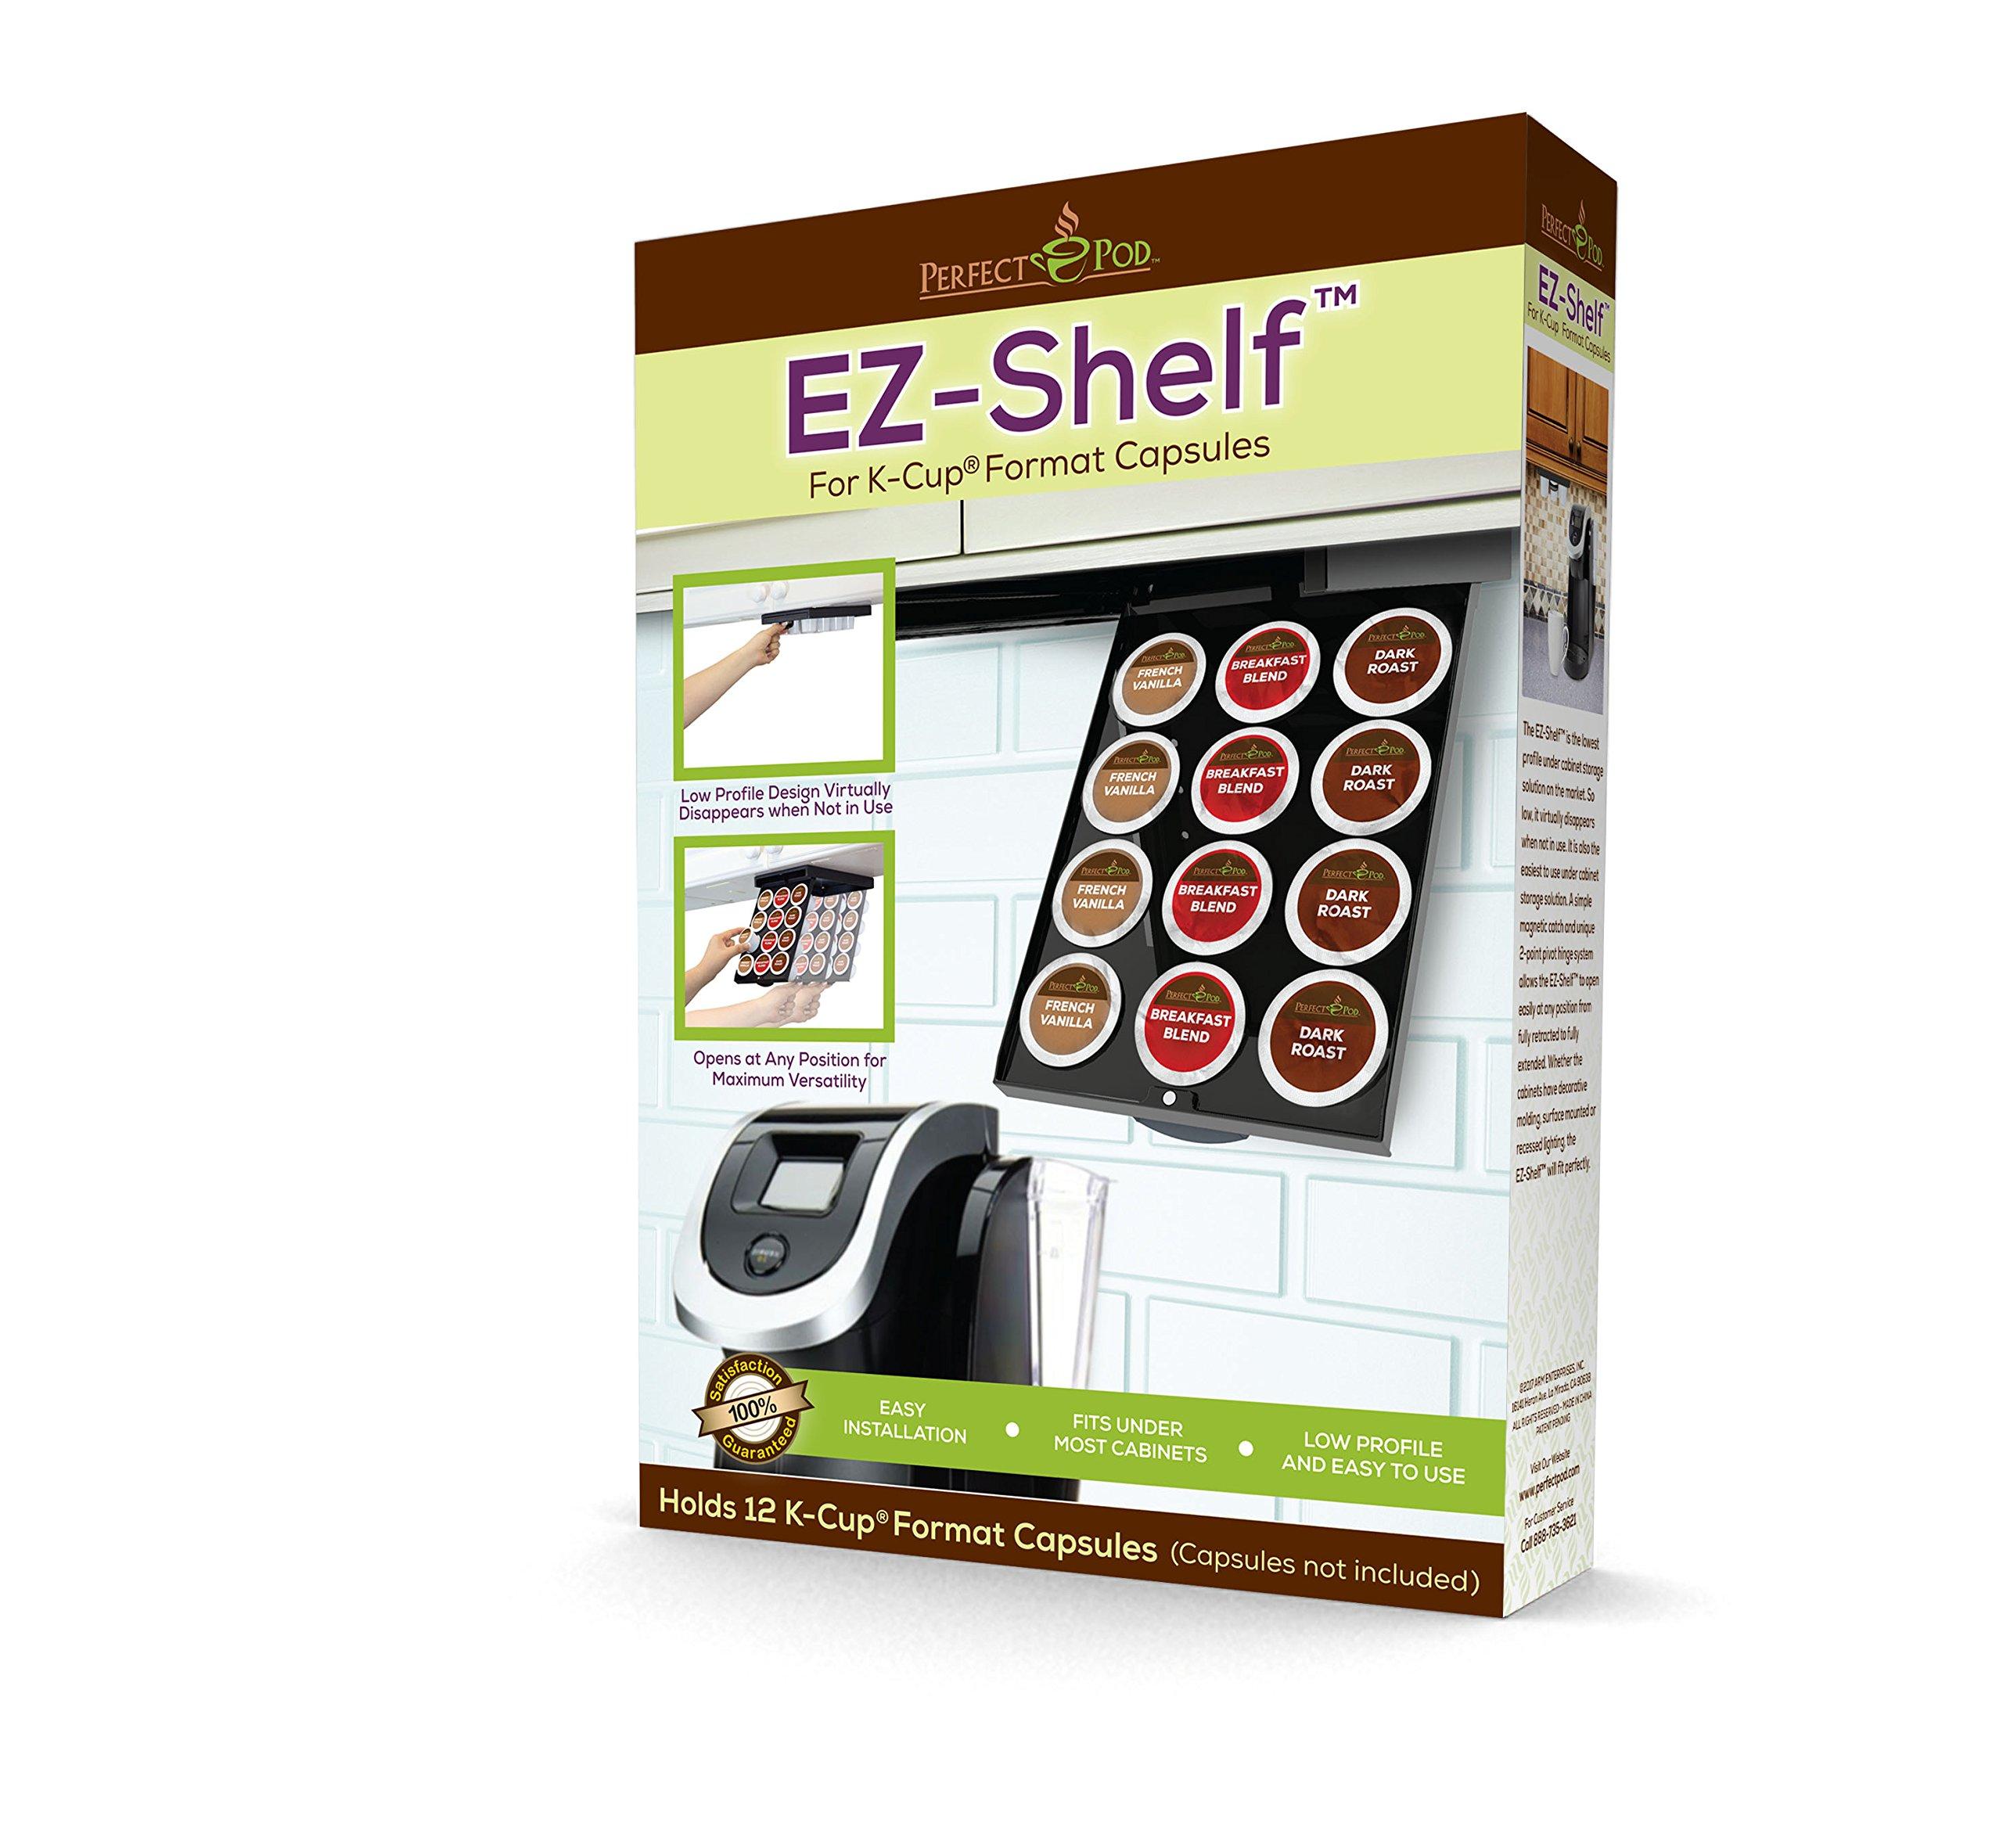 EZ-Shelf for K-Cup Capsules